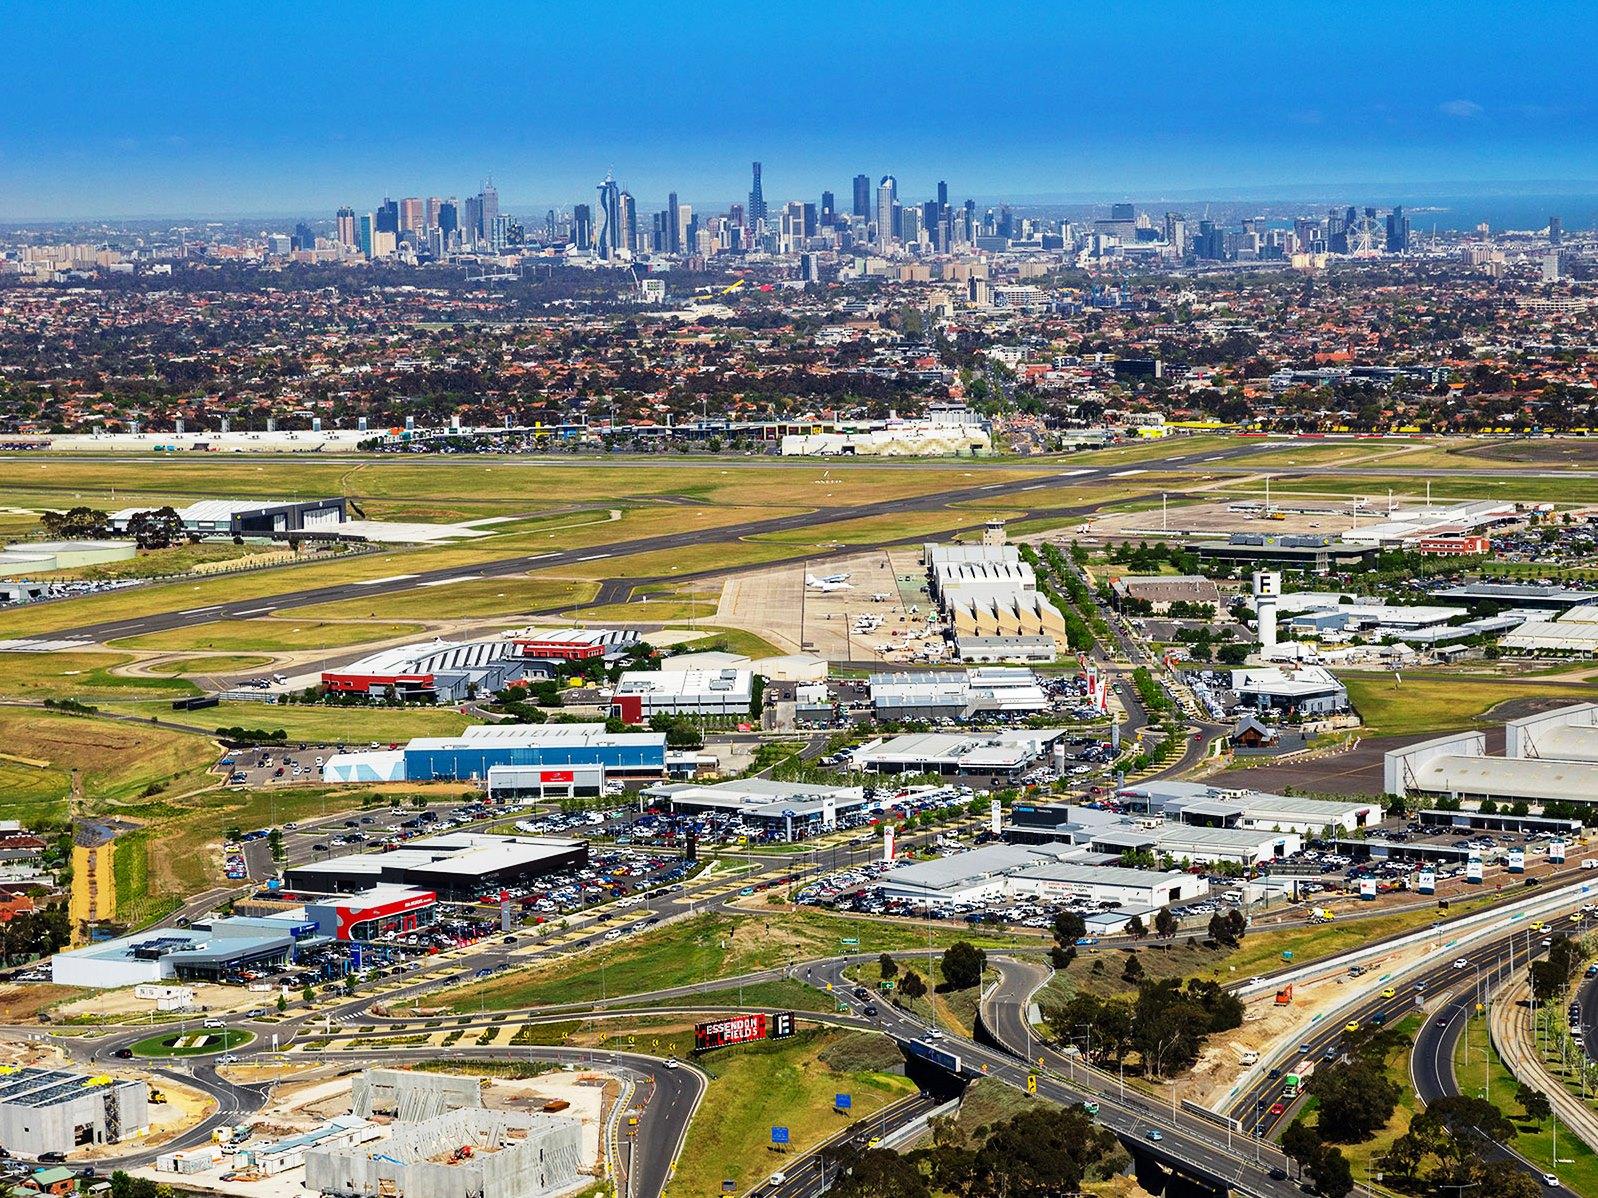 28.melbourne airport city